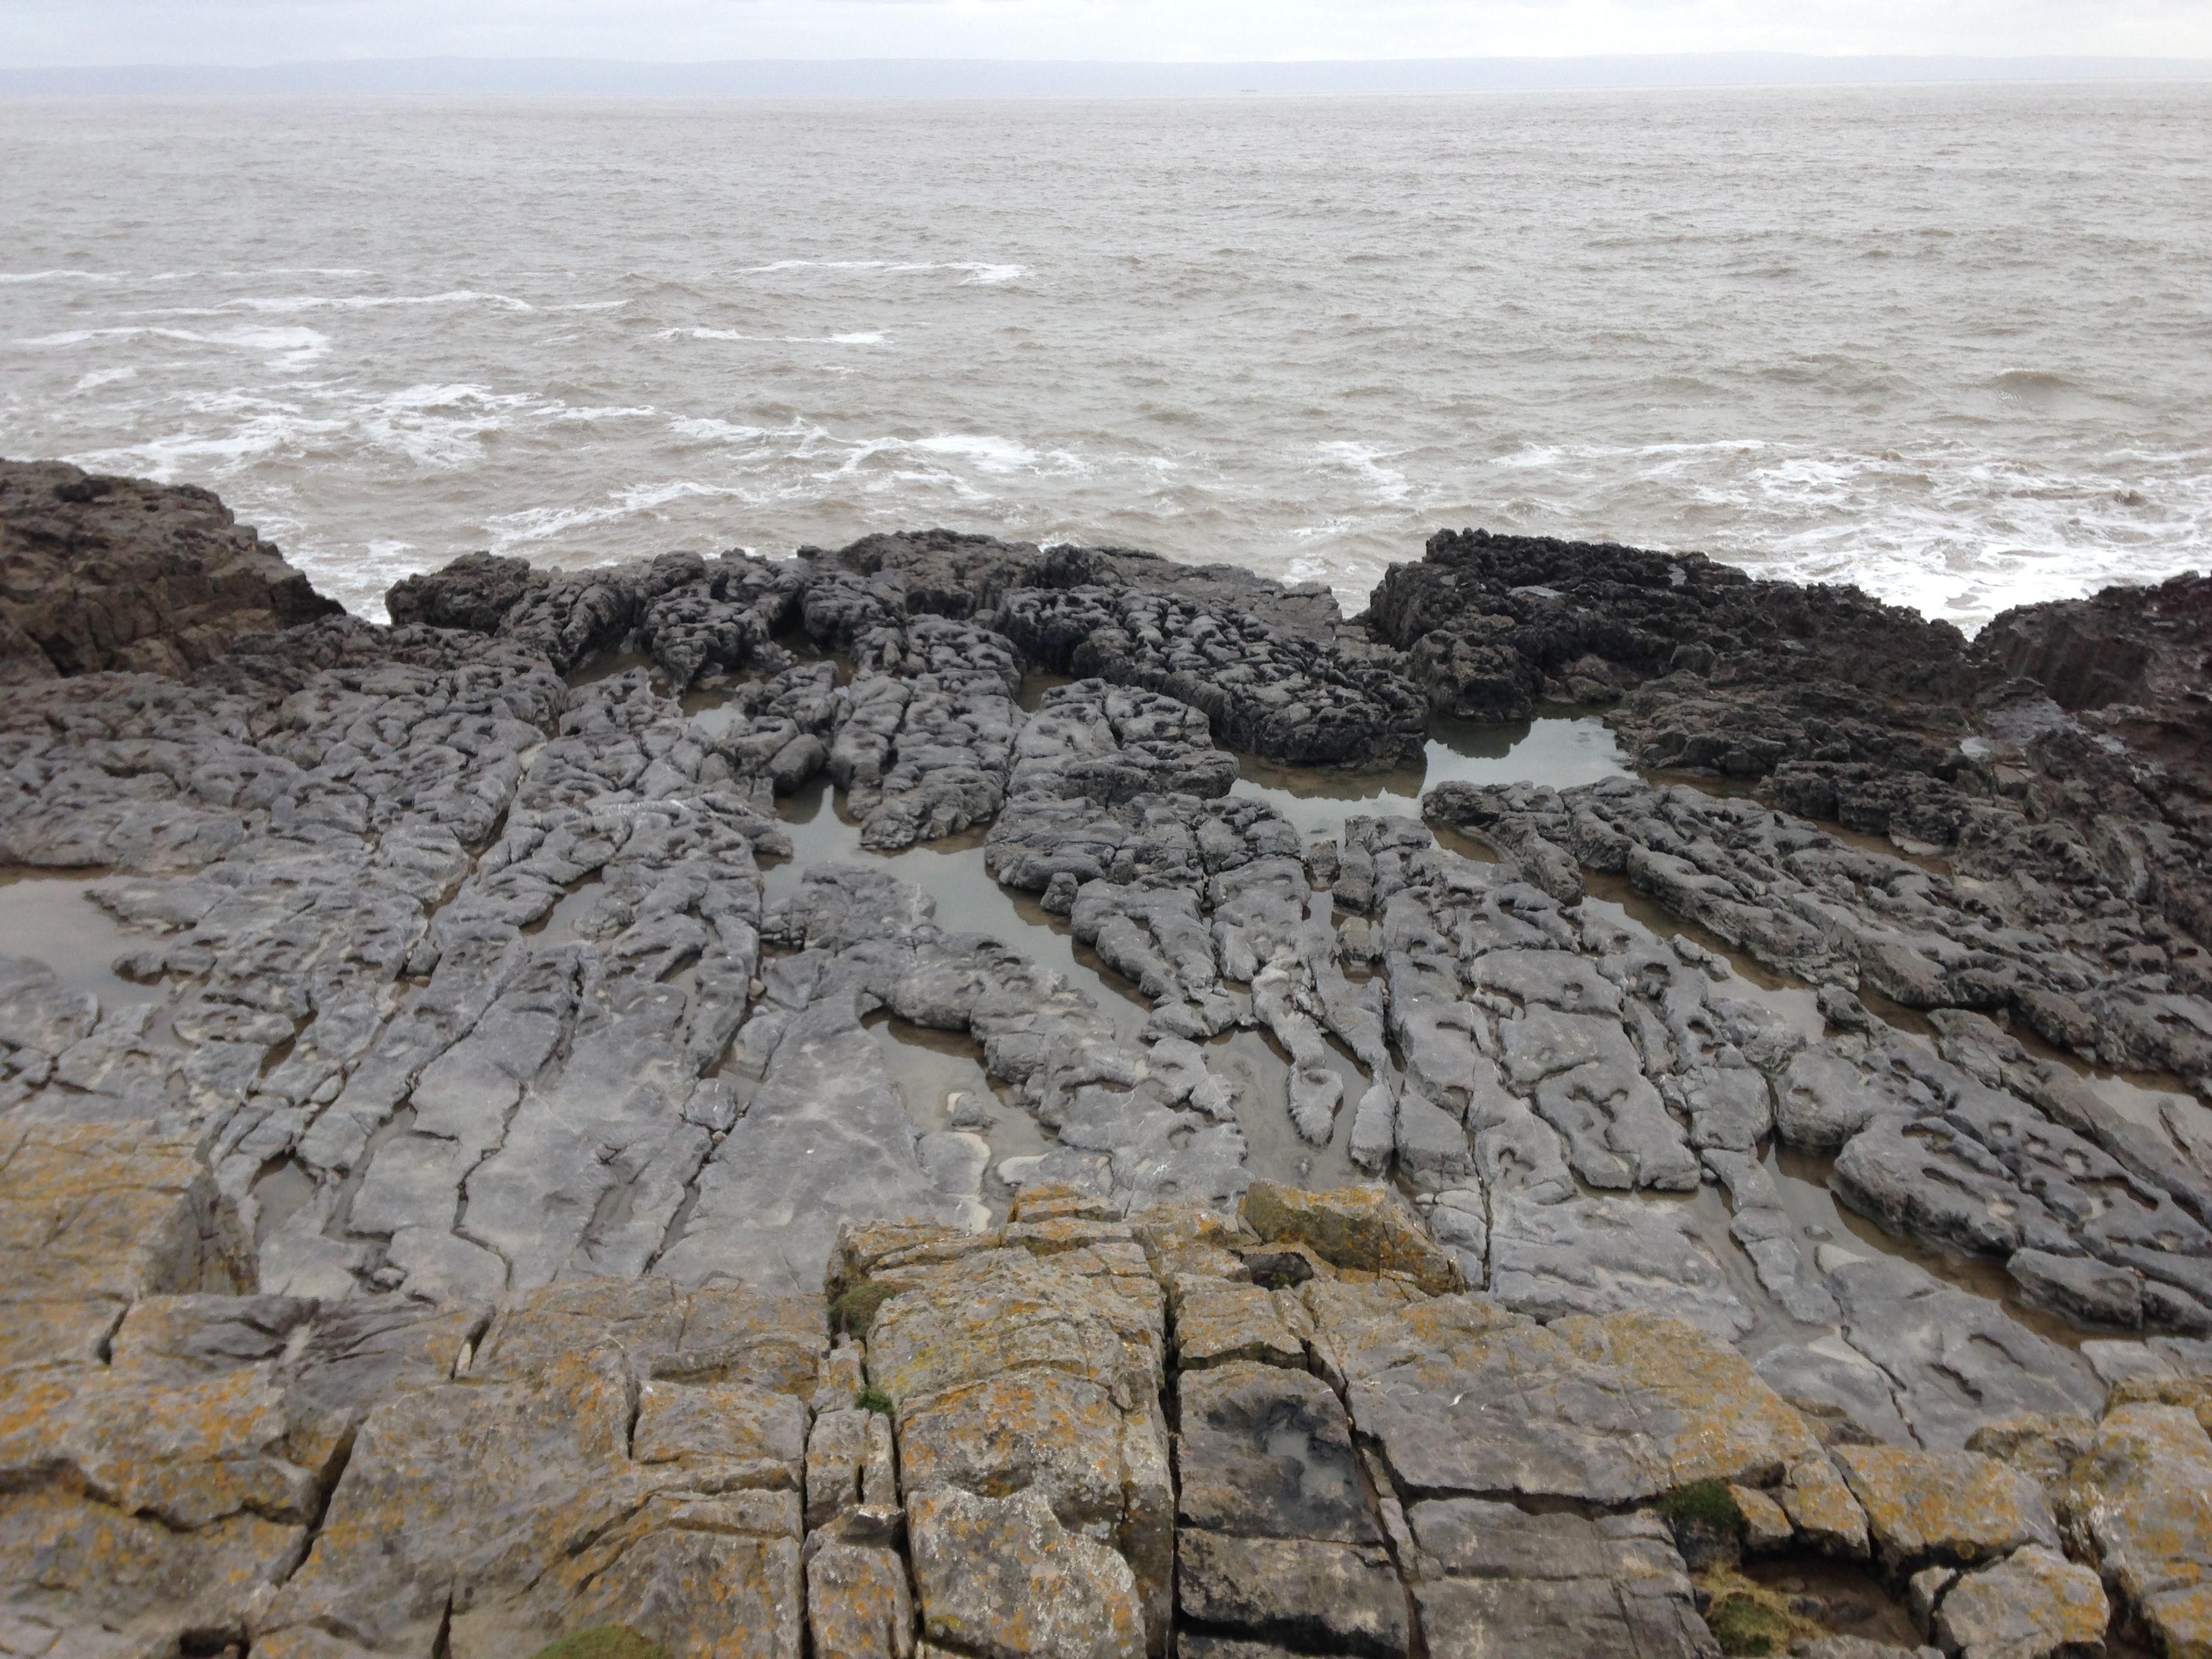 Lava rocks by the coast